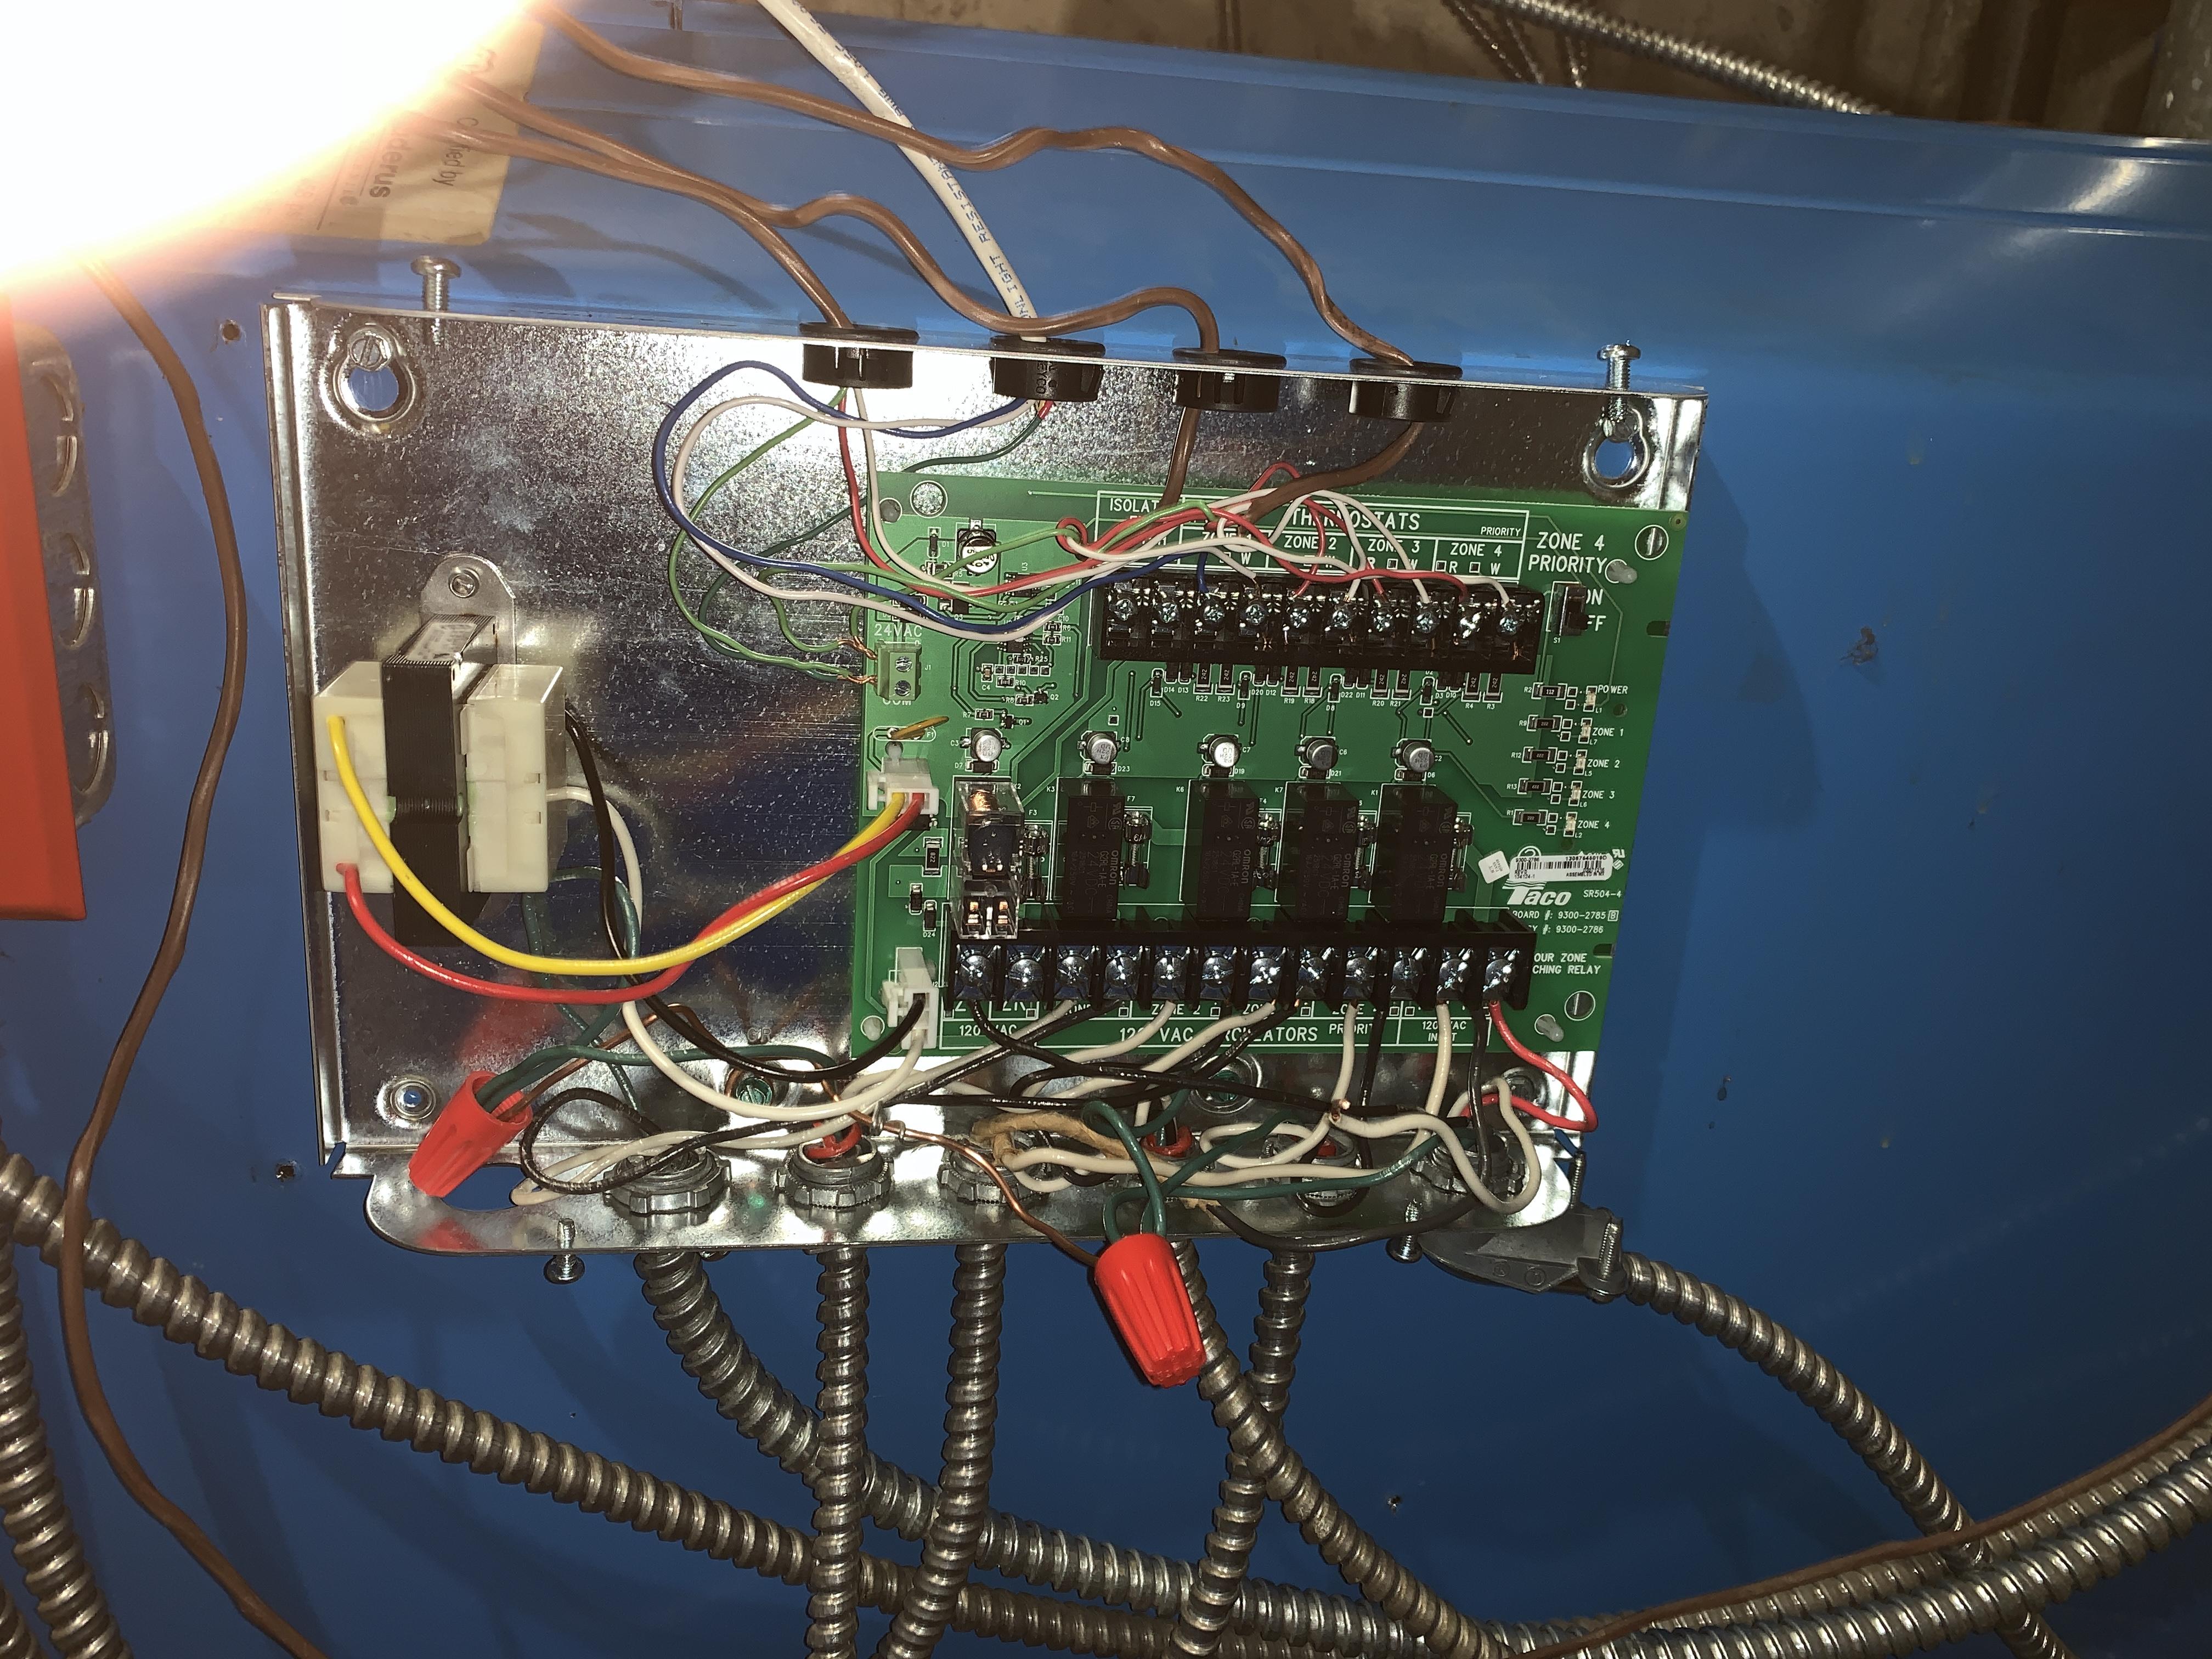 Wiring Taco Sr504-4 Help  - Hvac